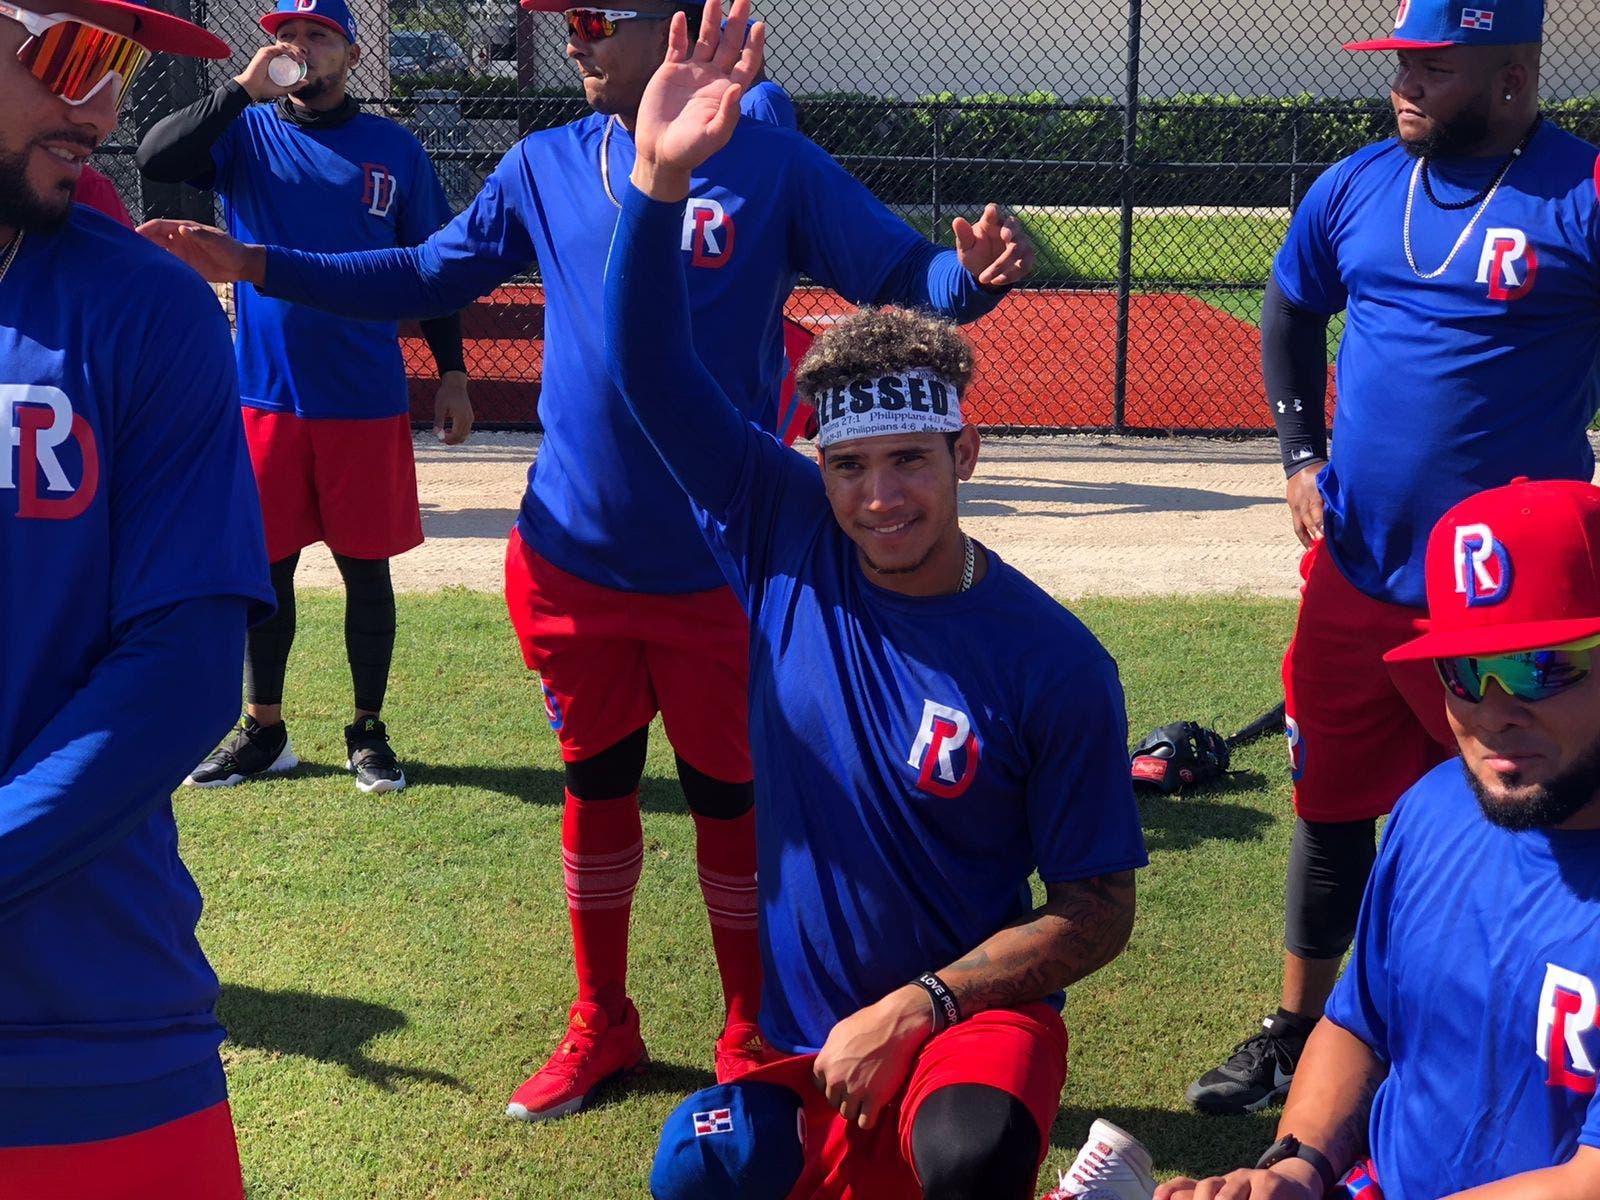 Jugadores afiliados a MLB se siguen reportando a equipo RD